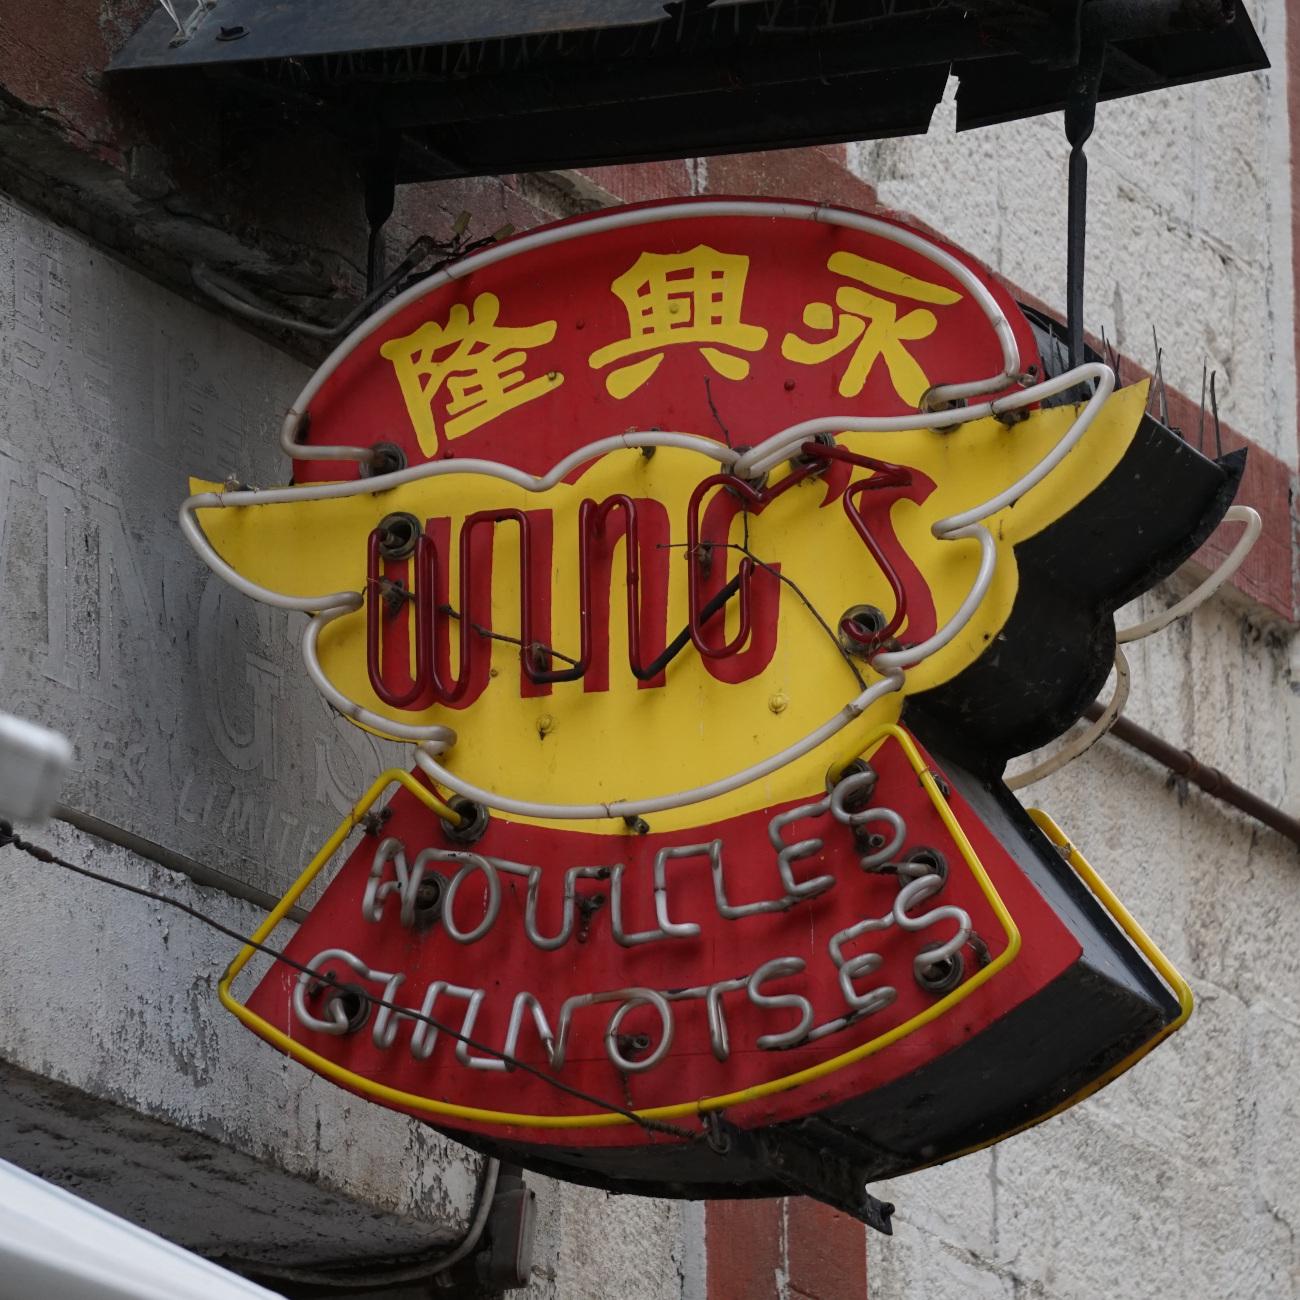 Enseigne Wing's Nouilles chinoises